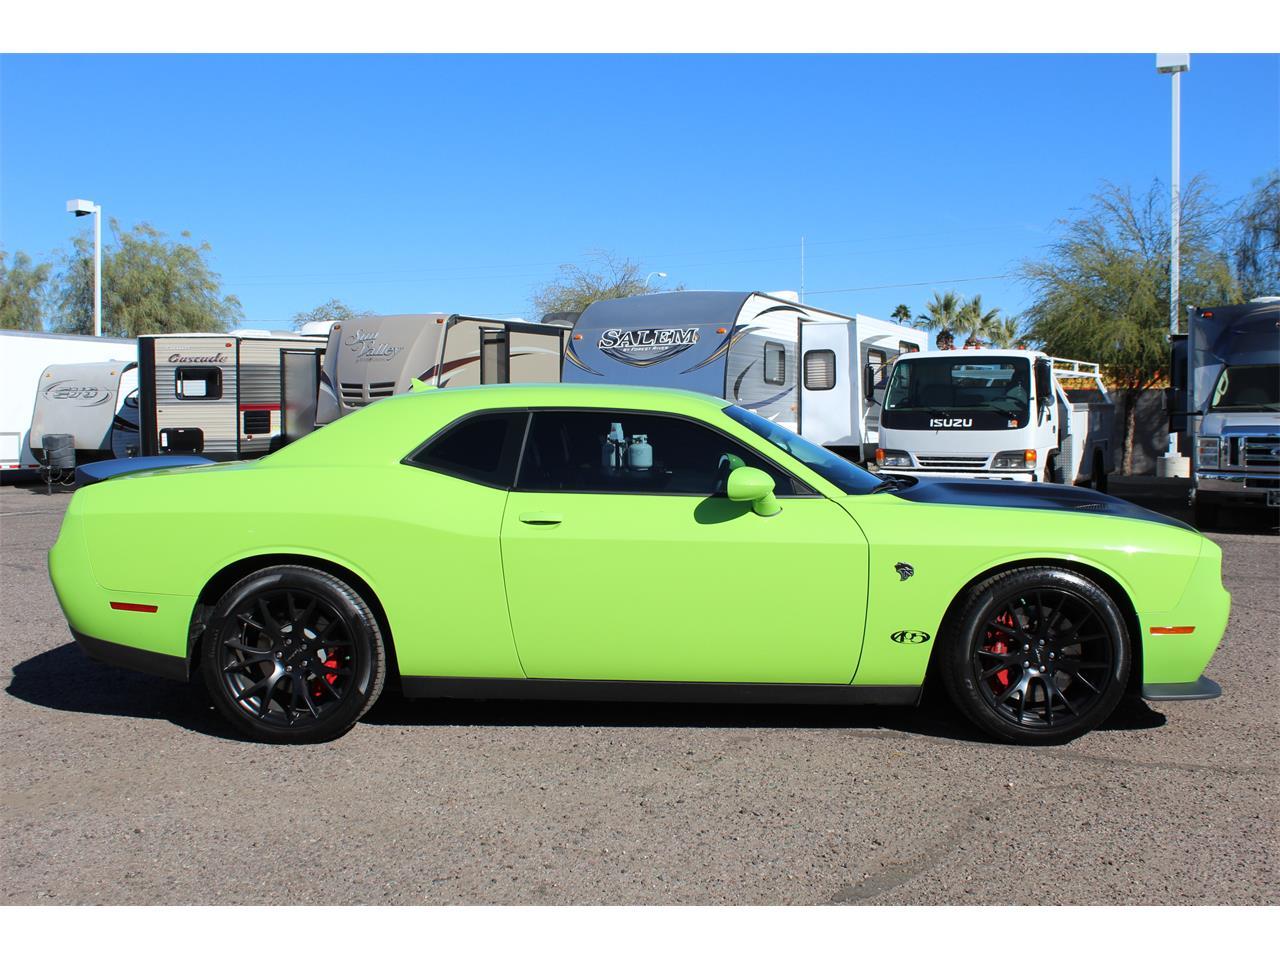 dodge hellcat for sale az 2015 Dodge Challenger for sale in Scottsdale, AZ